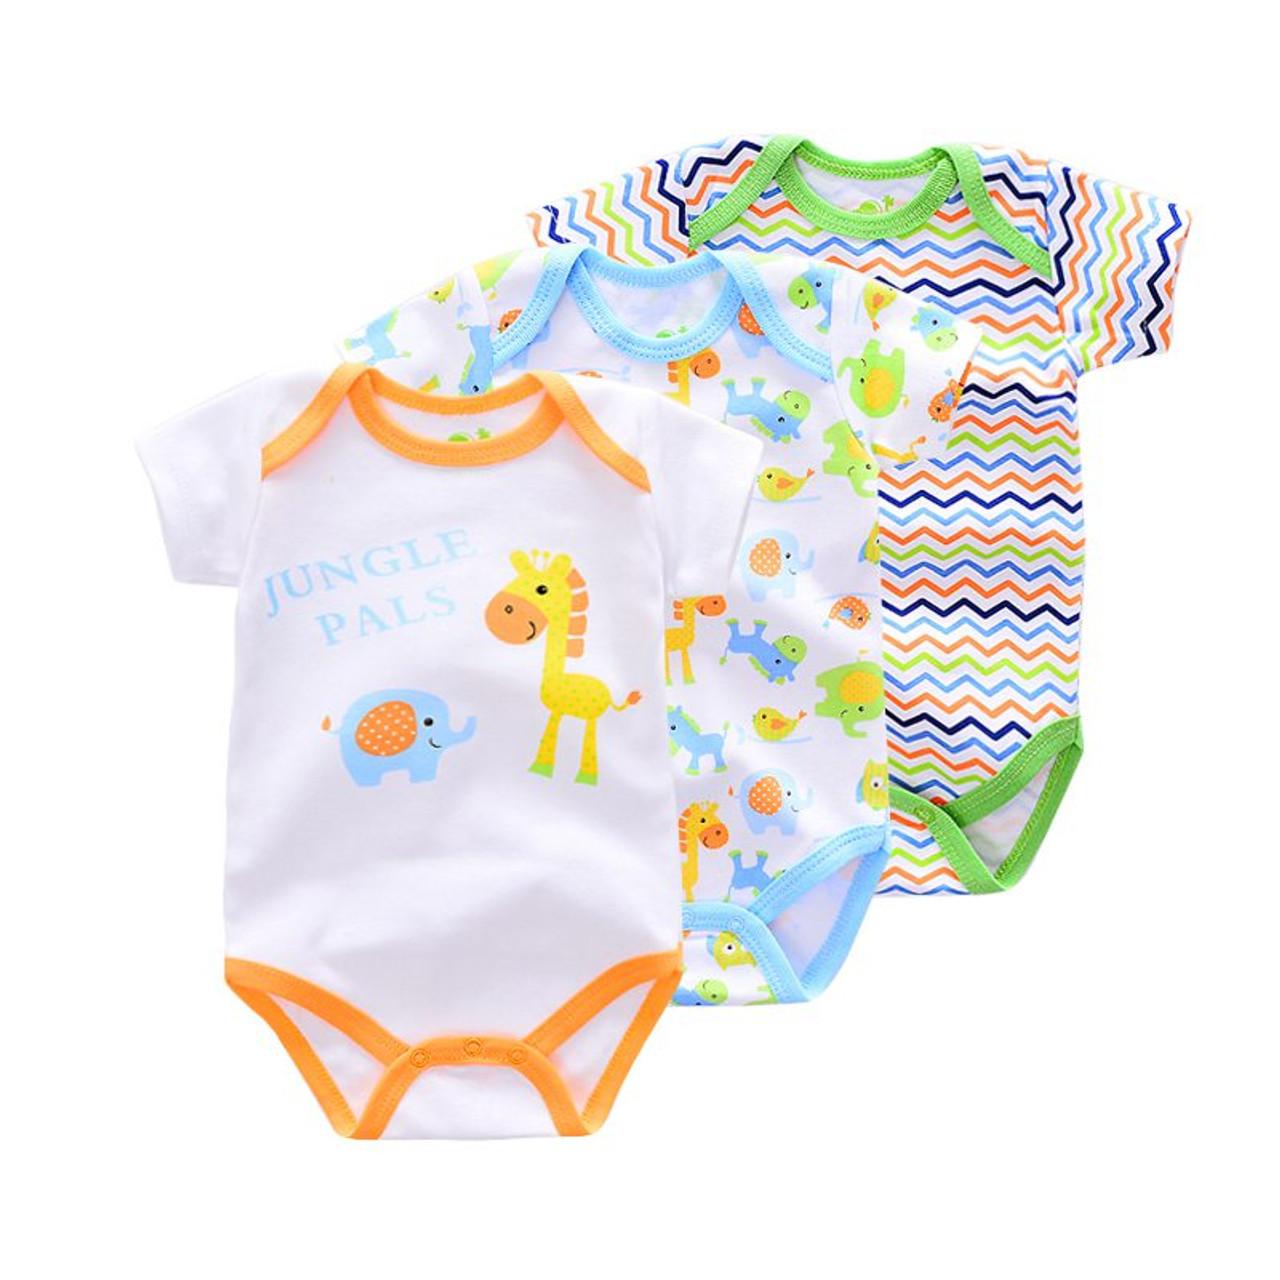 95cb8d2e5c71 3 Pieces lot Brand Summer Baby Boys Romper Animal style Short Sleeve ...